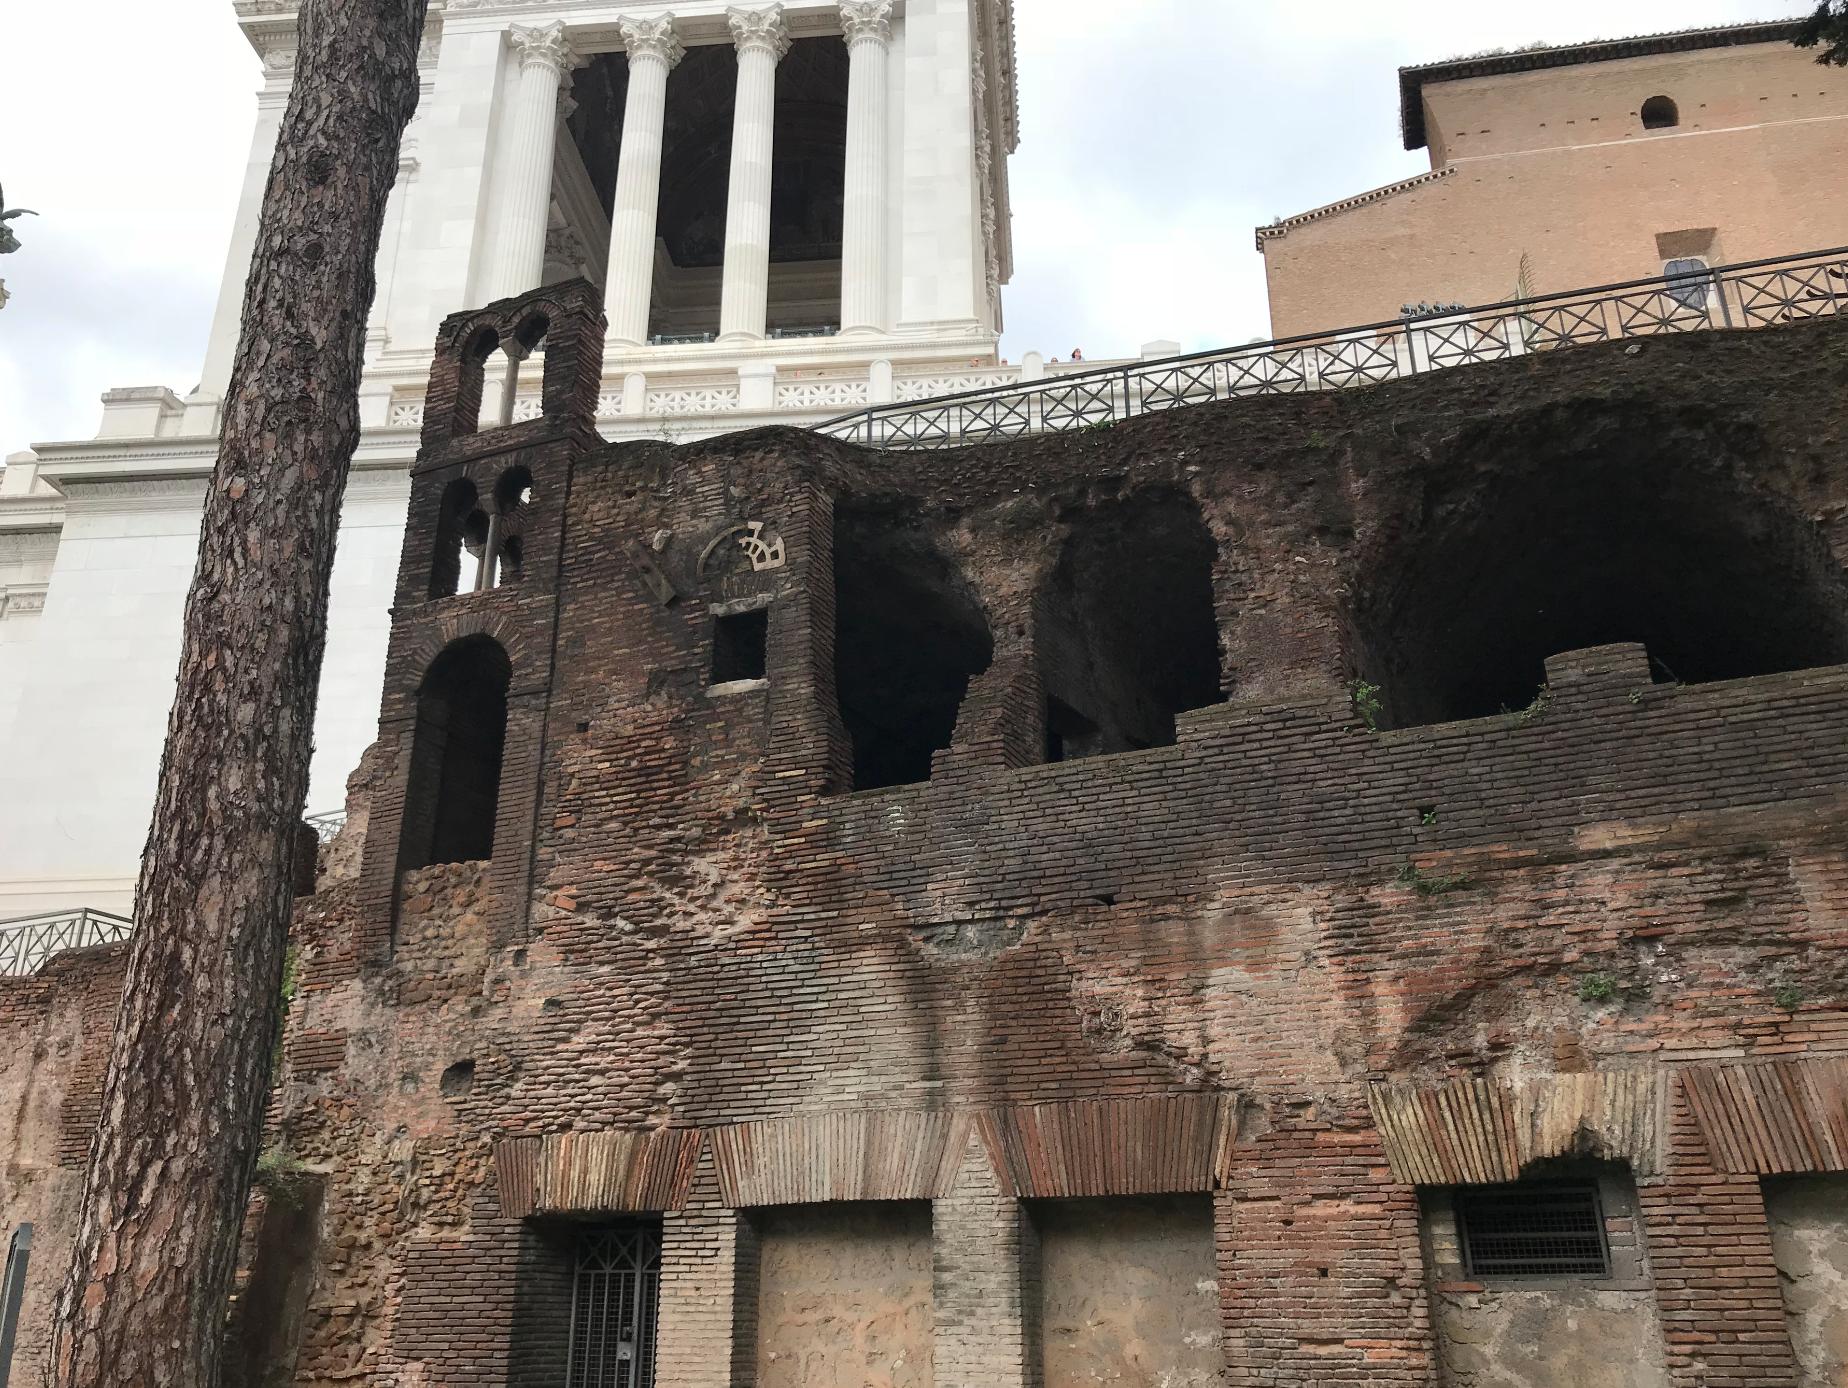 Insula Capitolinus (Capitoline Insula)